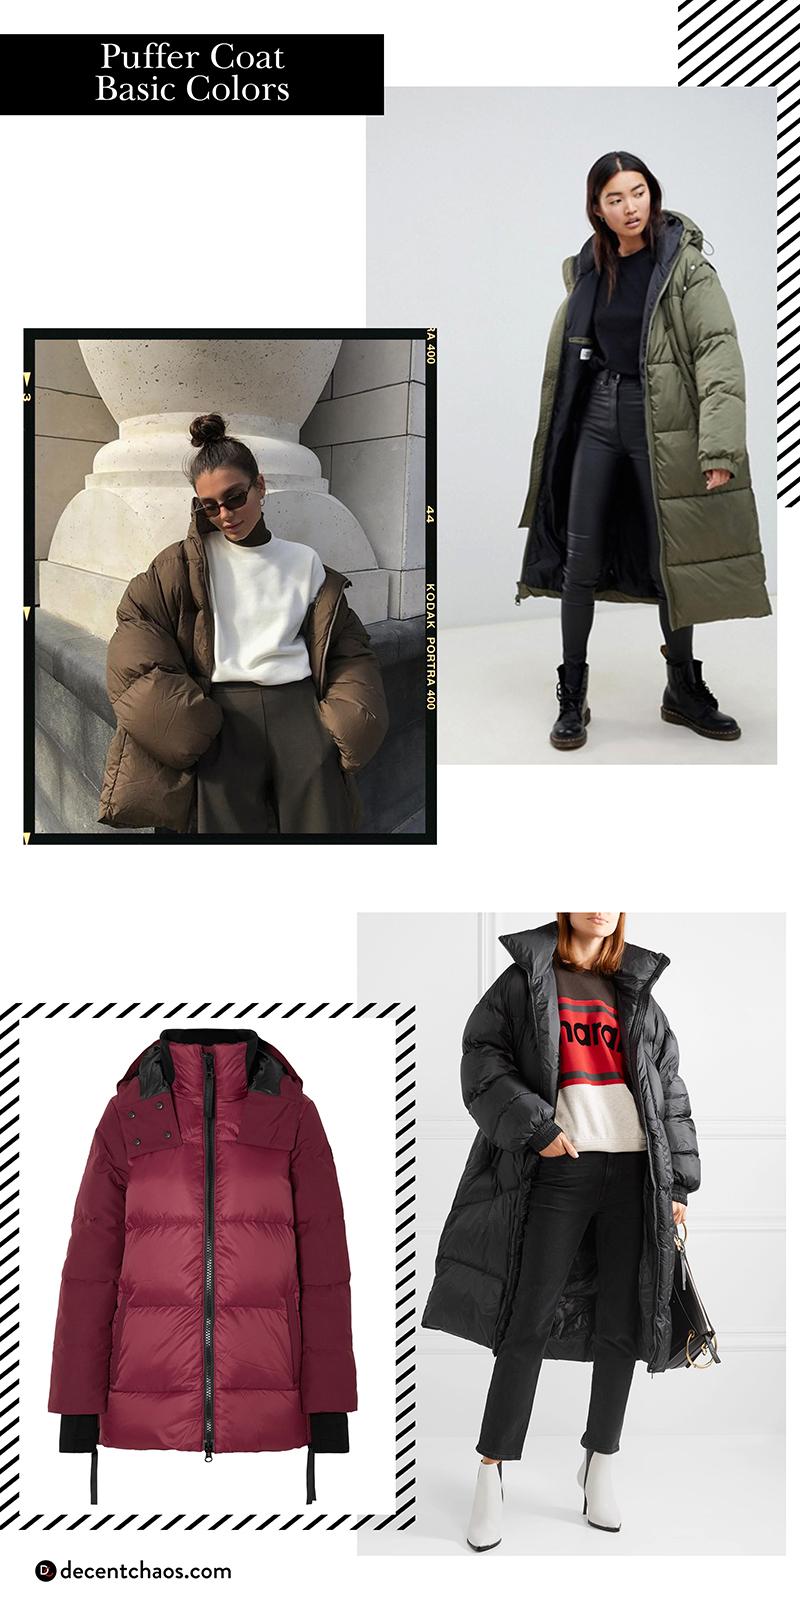 puffer-coat-basic-colors.jpg